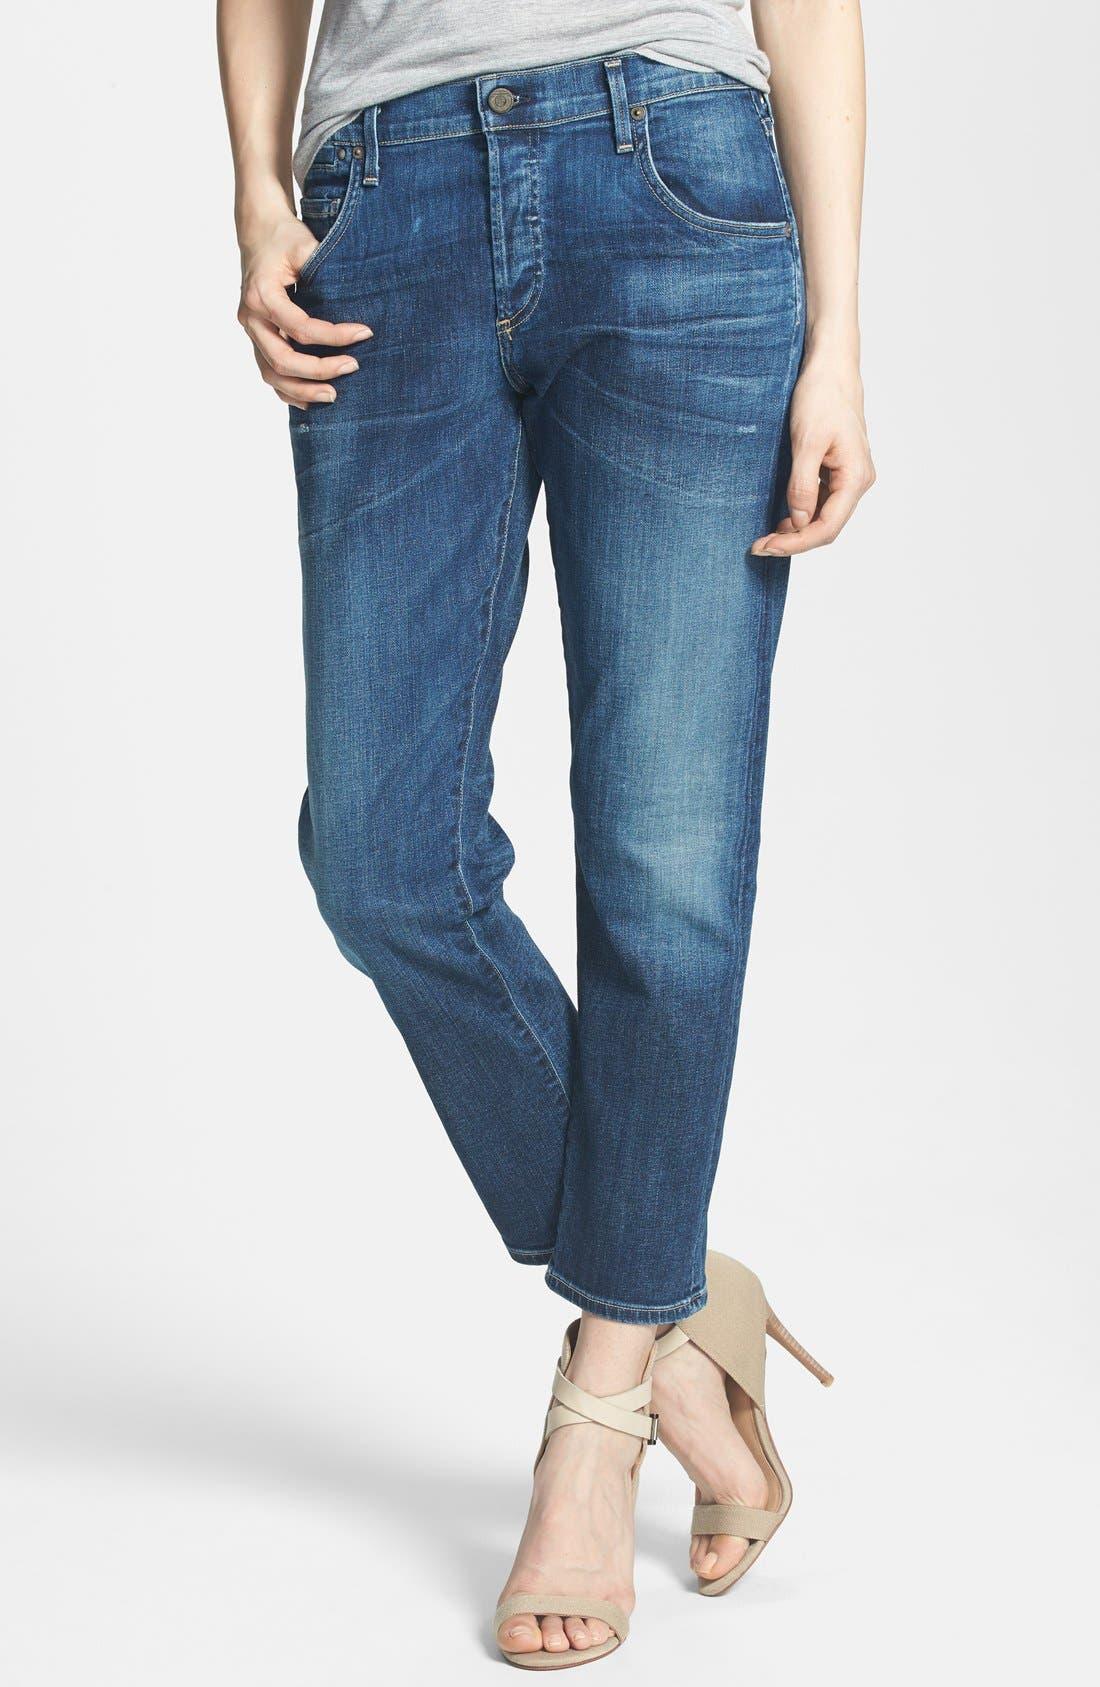 Emerson Slim Boyfriend Jeans,                         Main,                         color, Blue Ridge